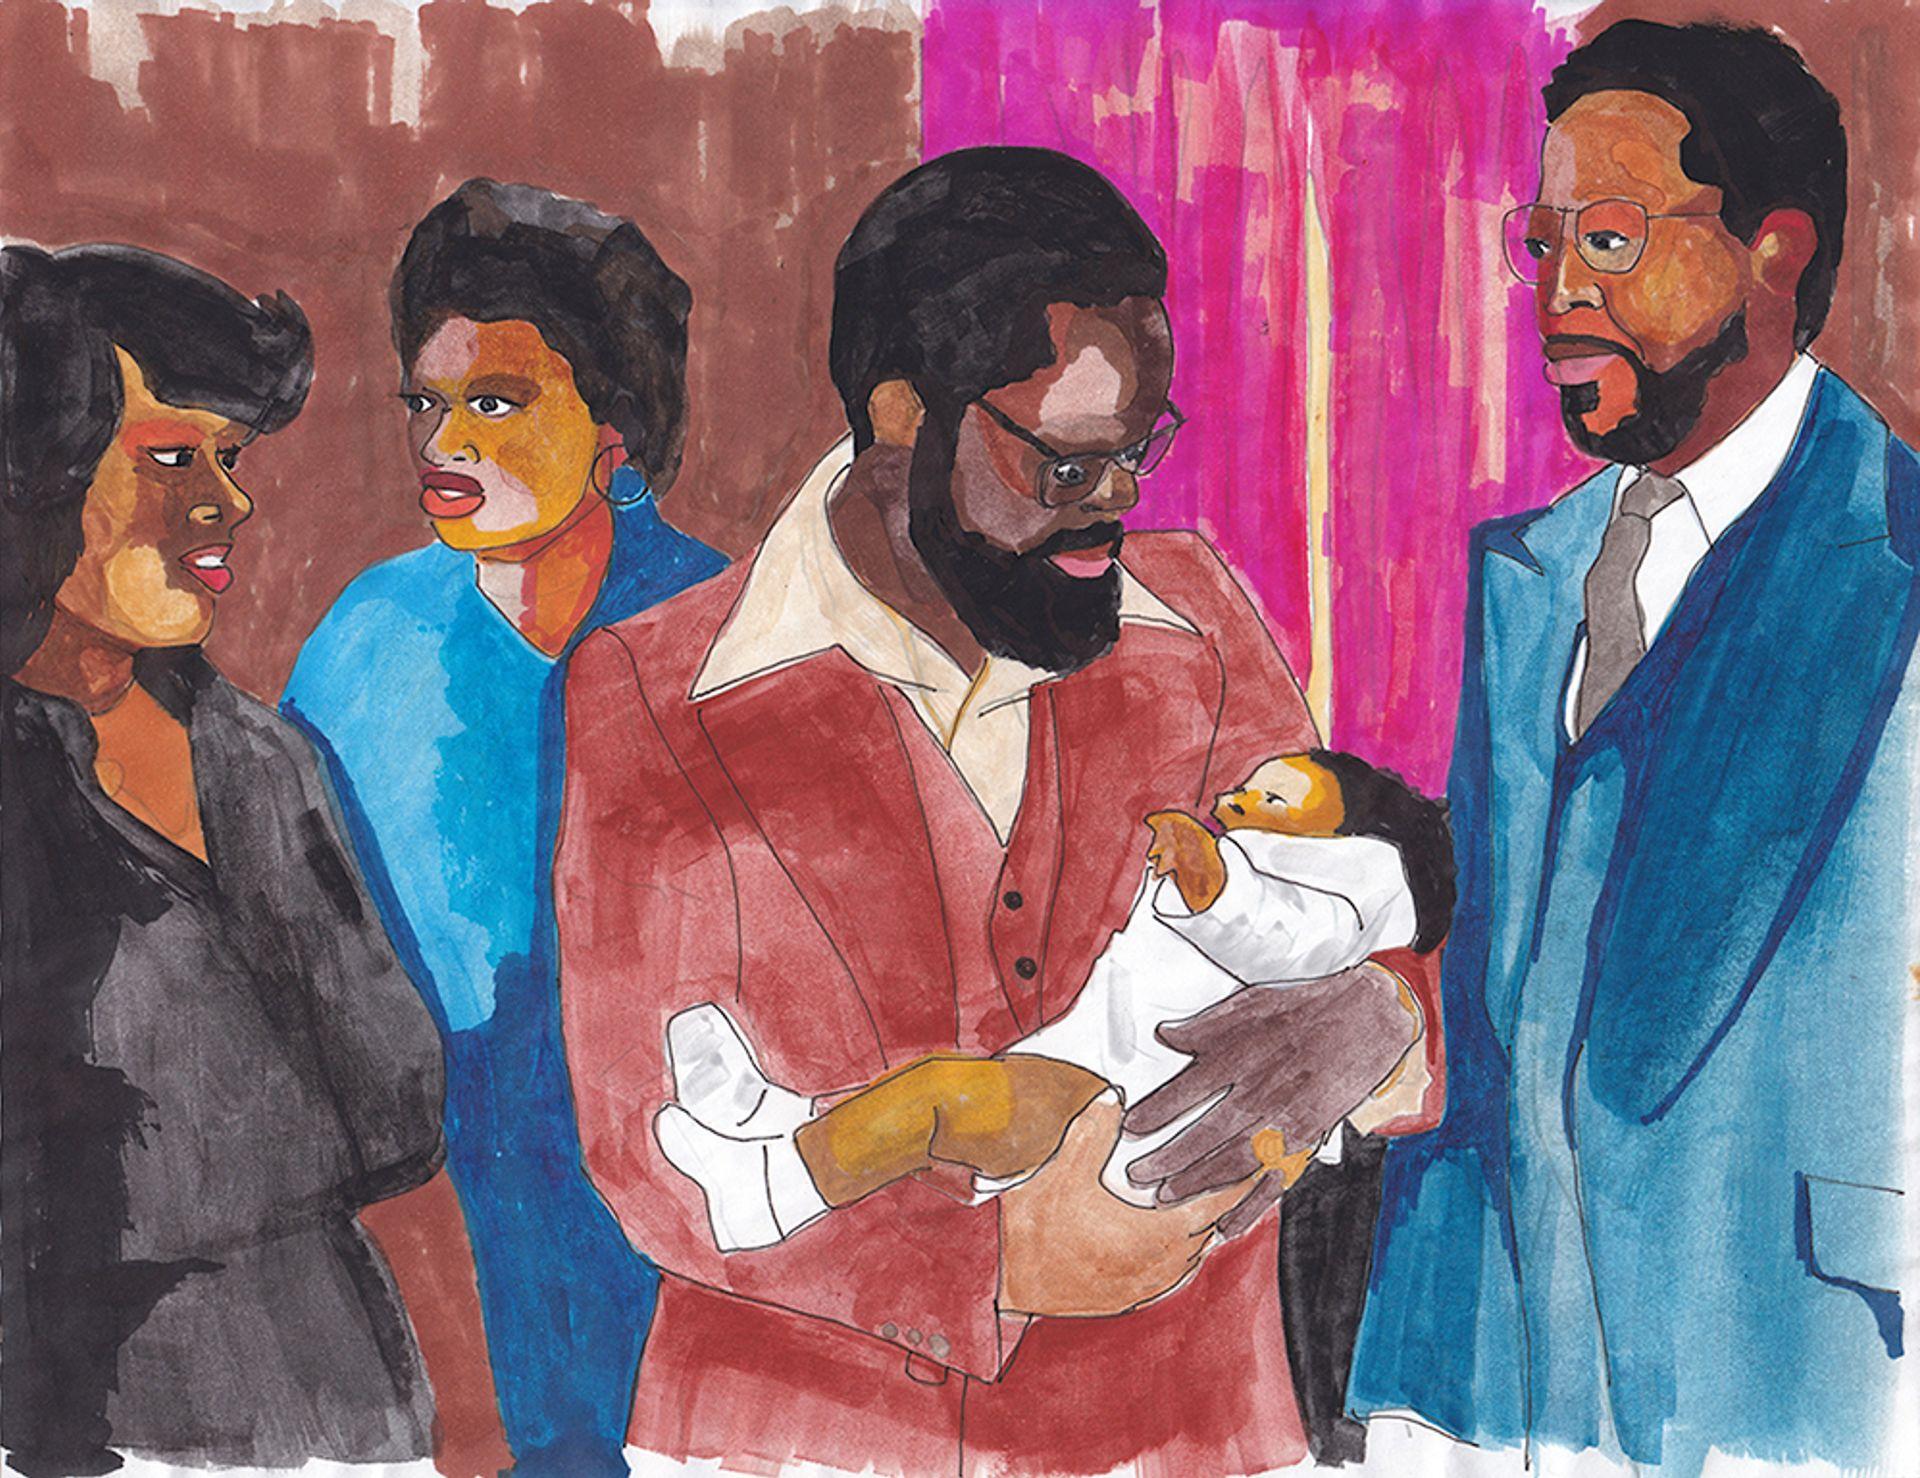 Derrick Adams, Family Portrait No. 6 Courtesy of the artist